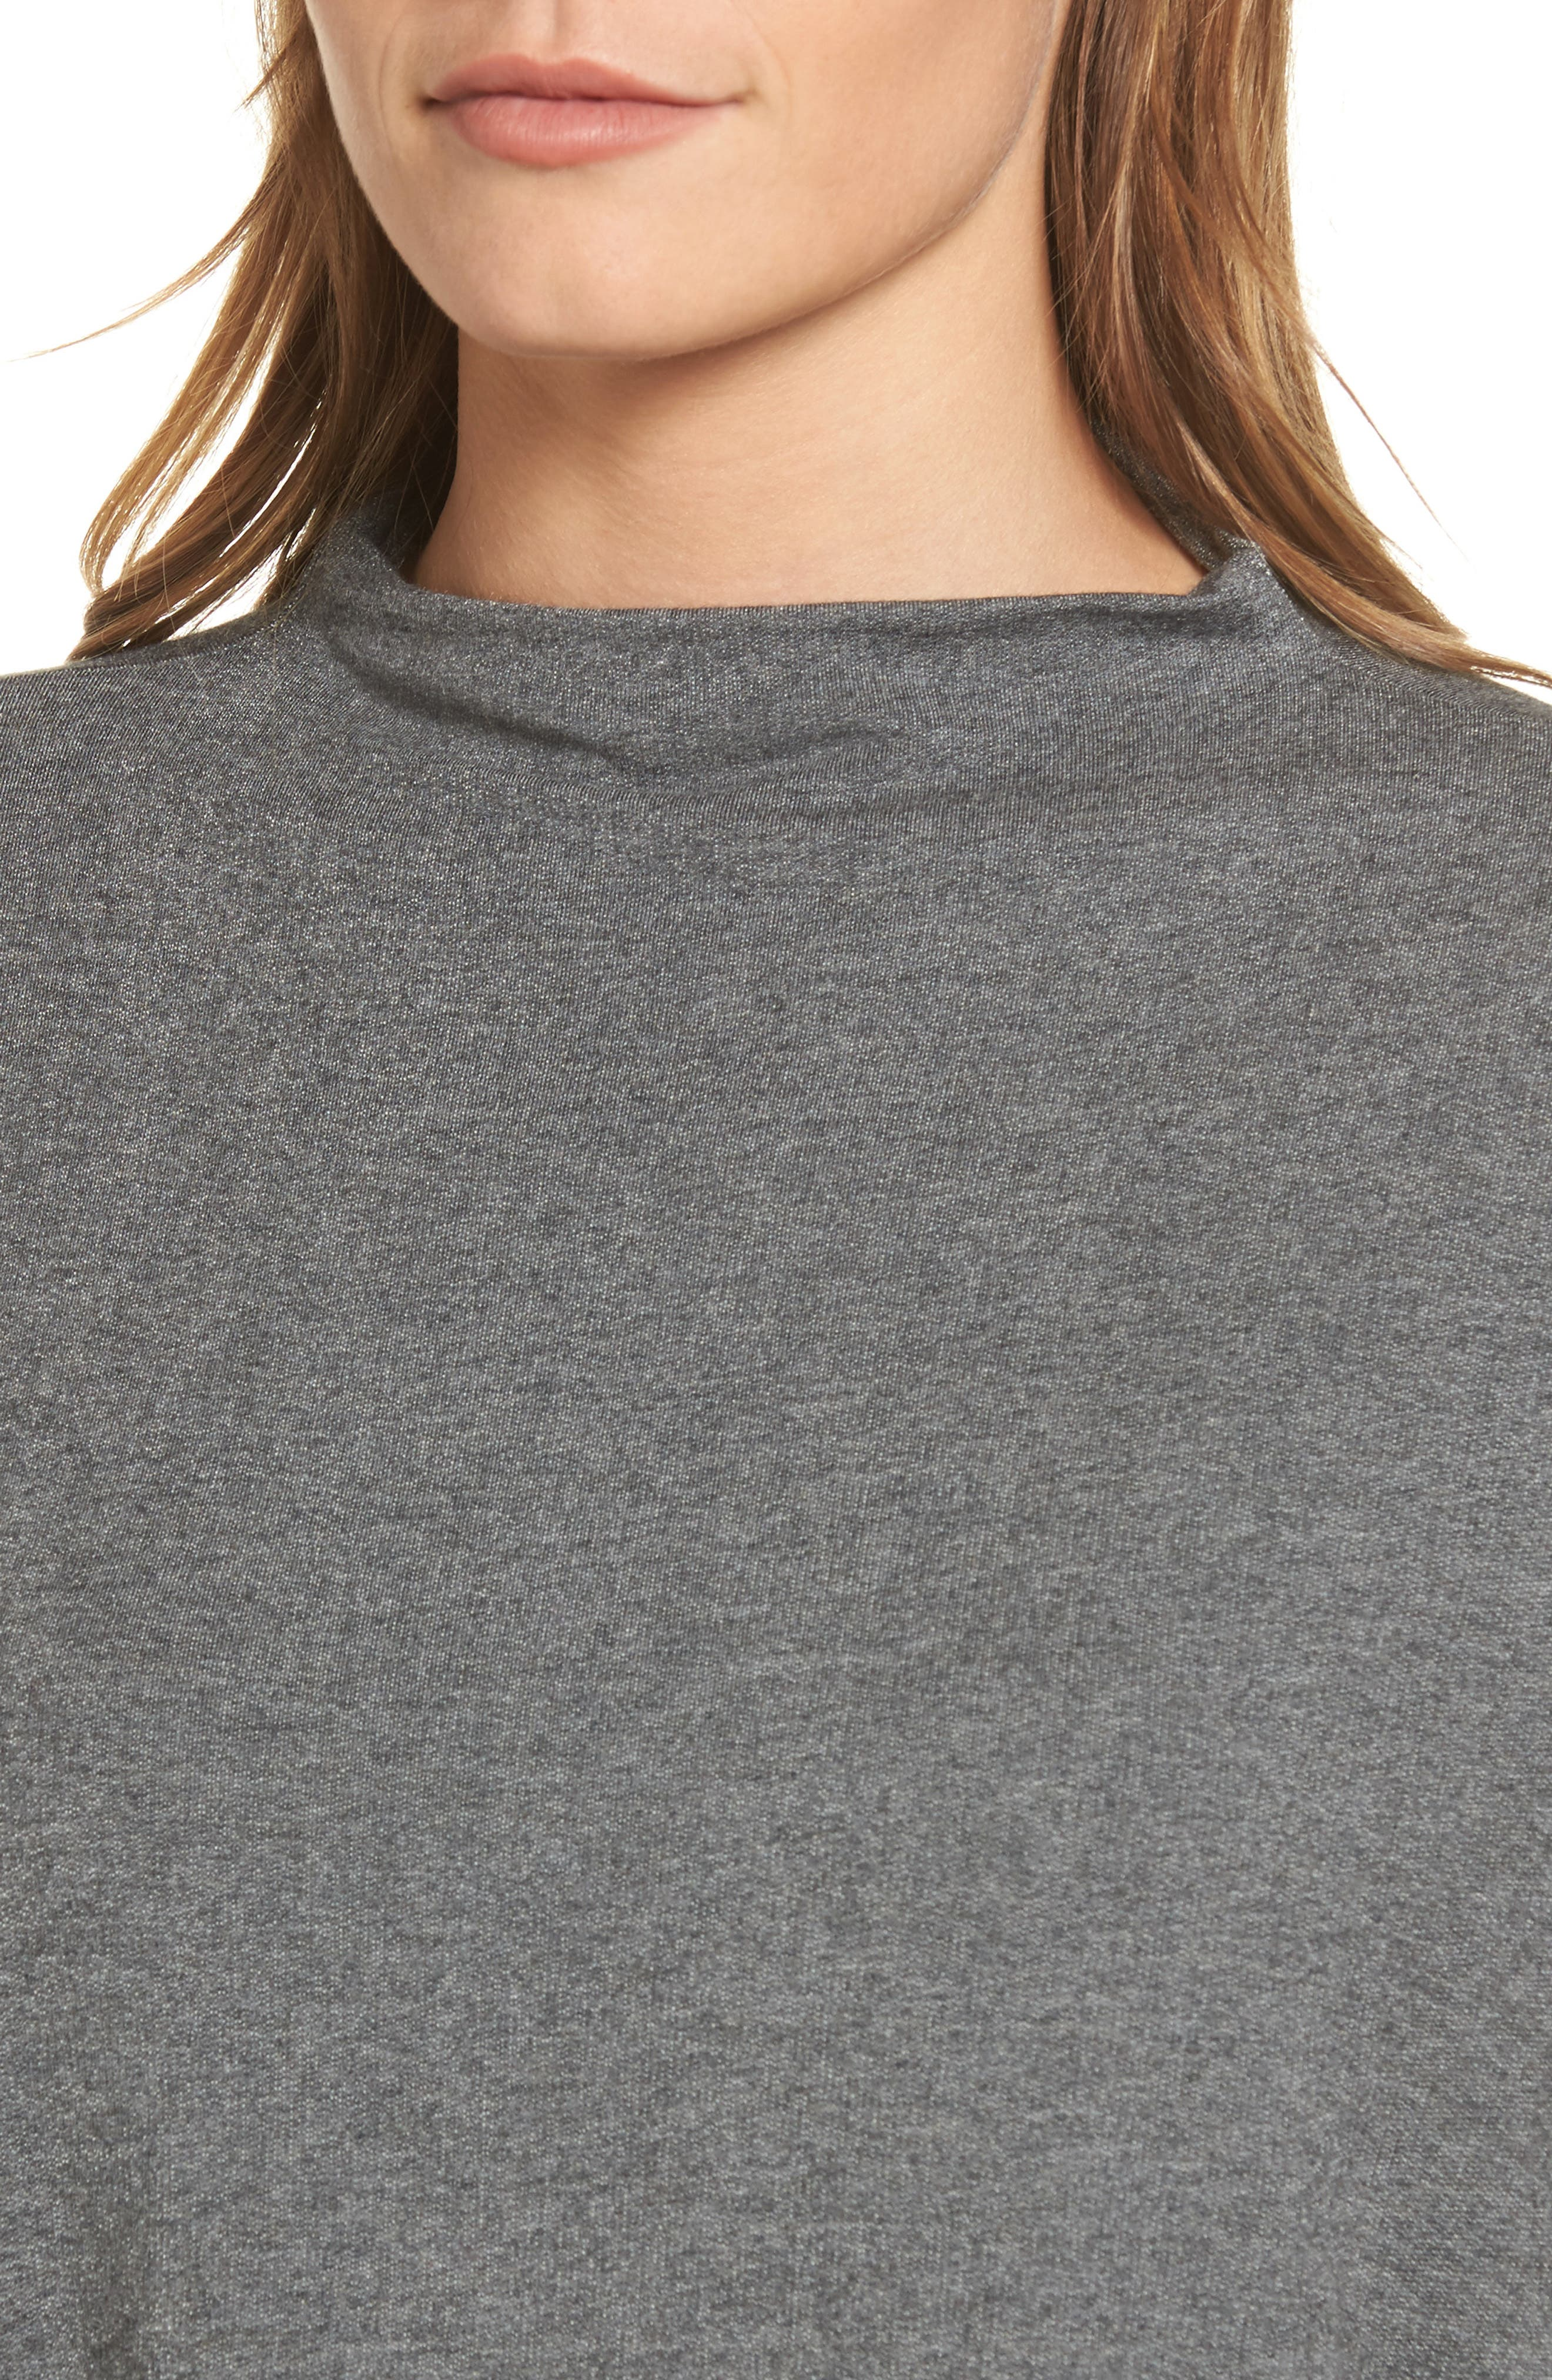 High Neck Sweatshirt,                             Alternate thumbnail 4, color,                             Charcoal Mix